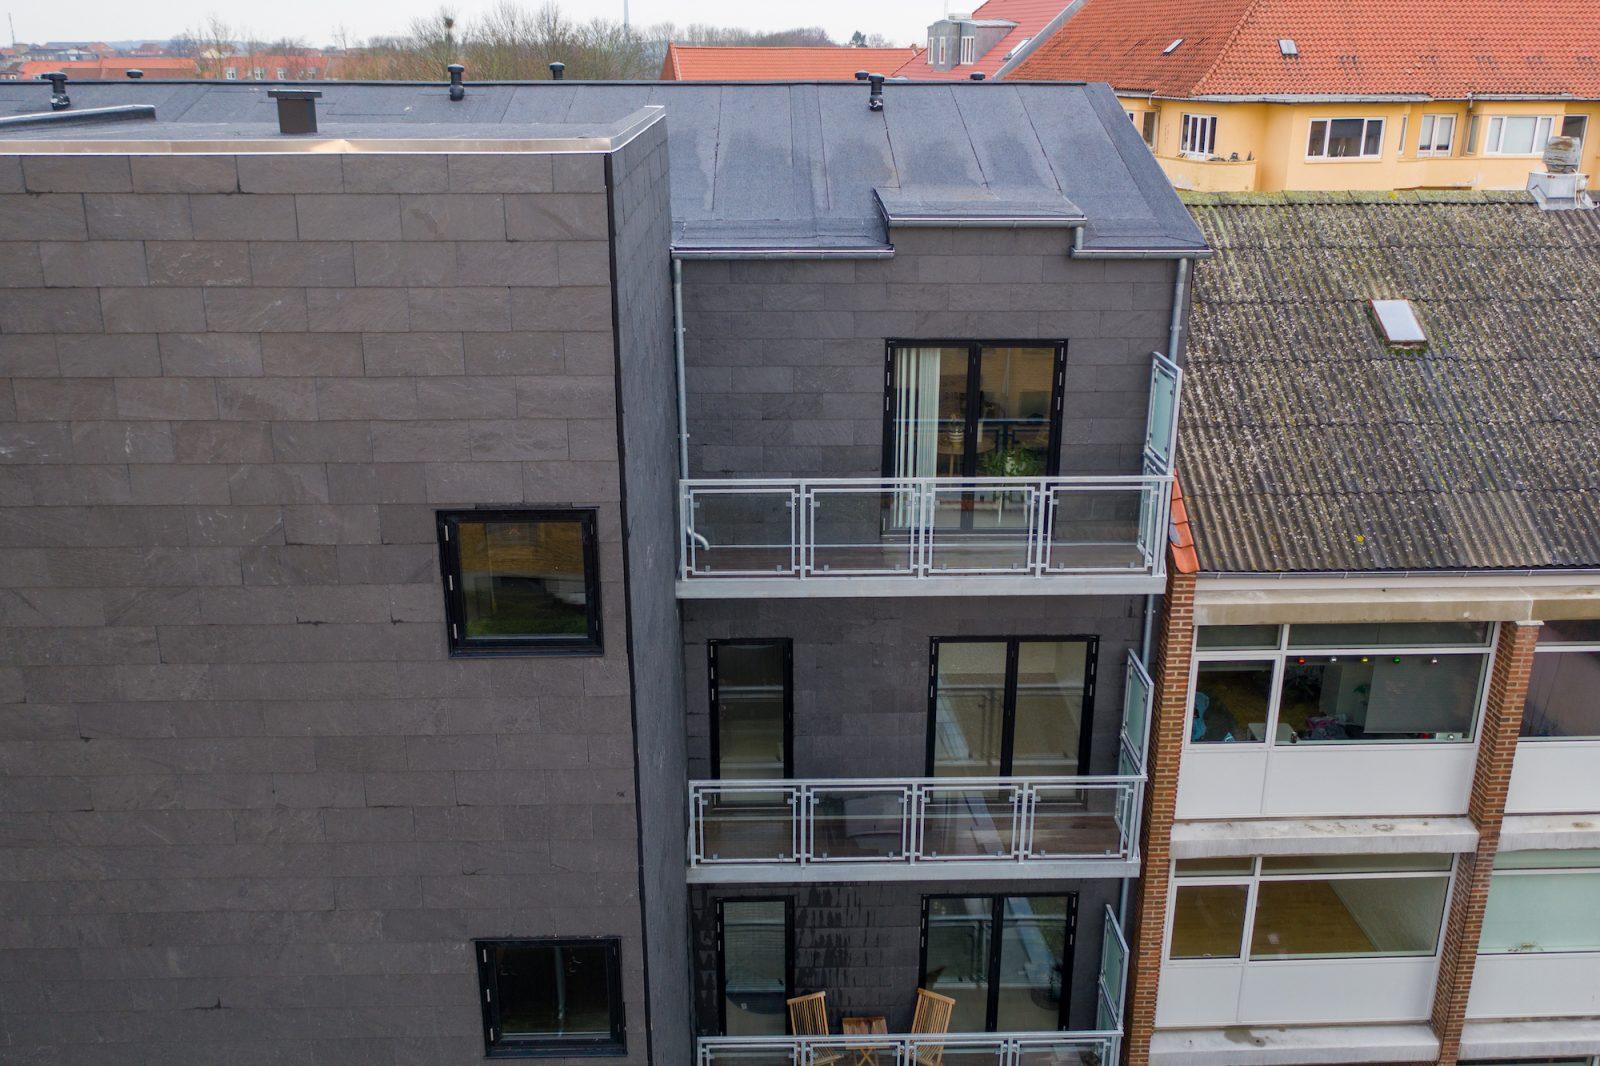 Bygning på Nyborgvej- Safe-con - 11